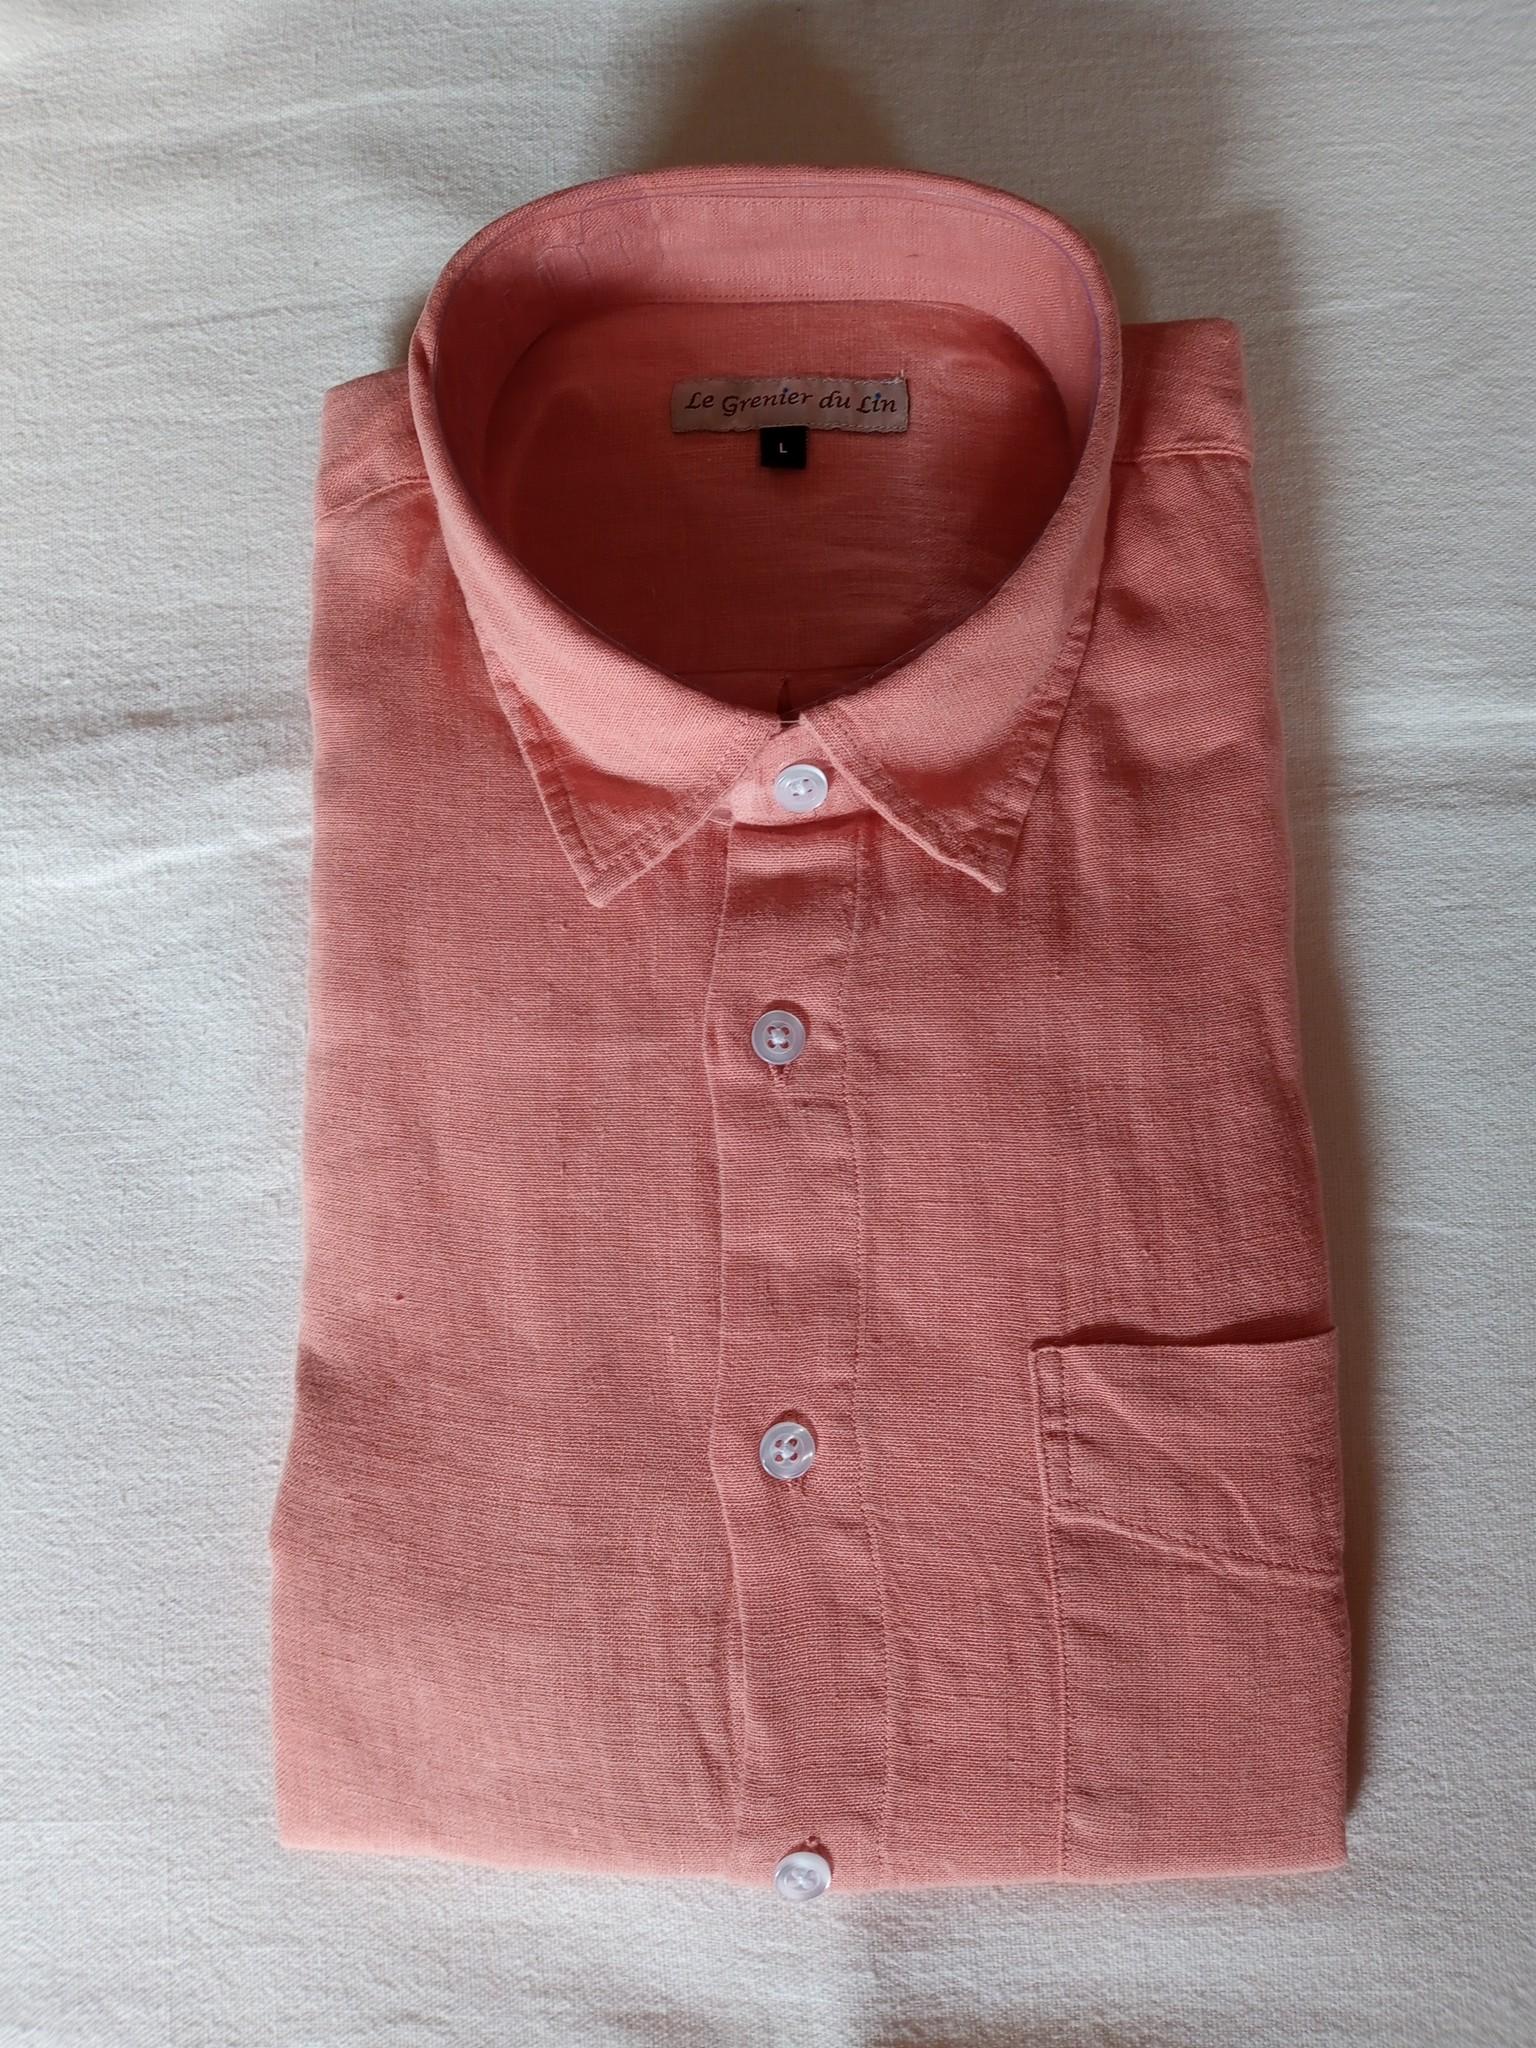 Le grenier du lin Long sleeve linen shirt salmon